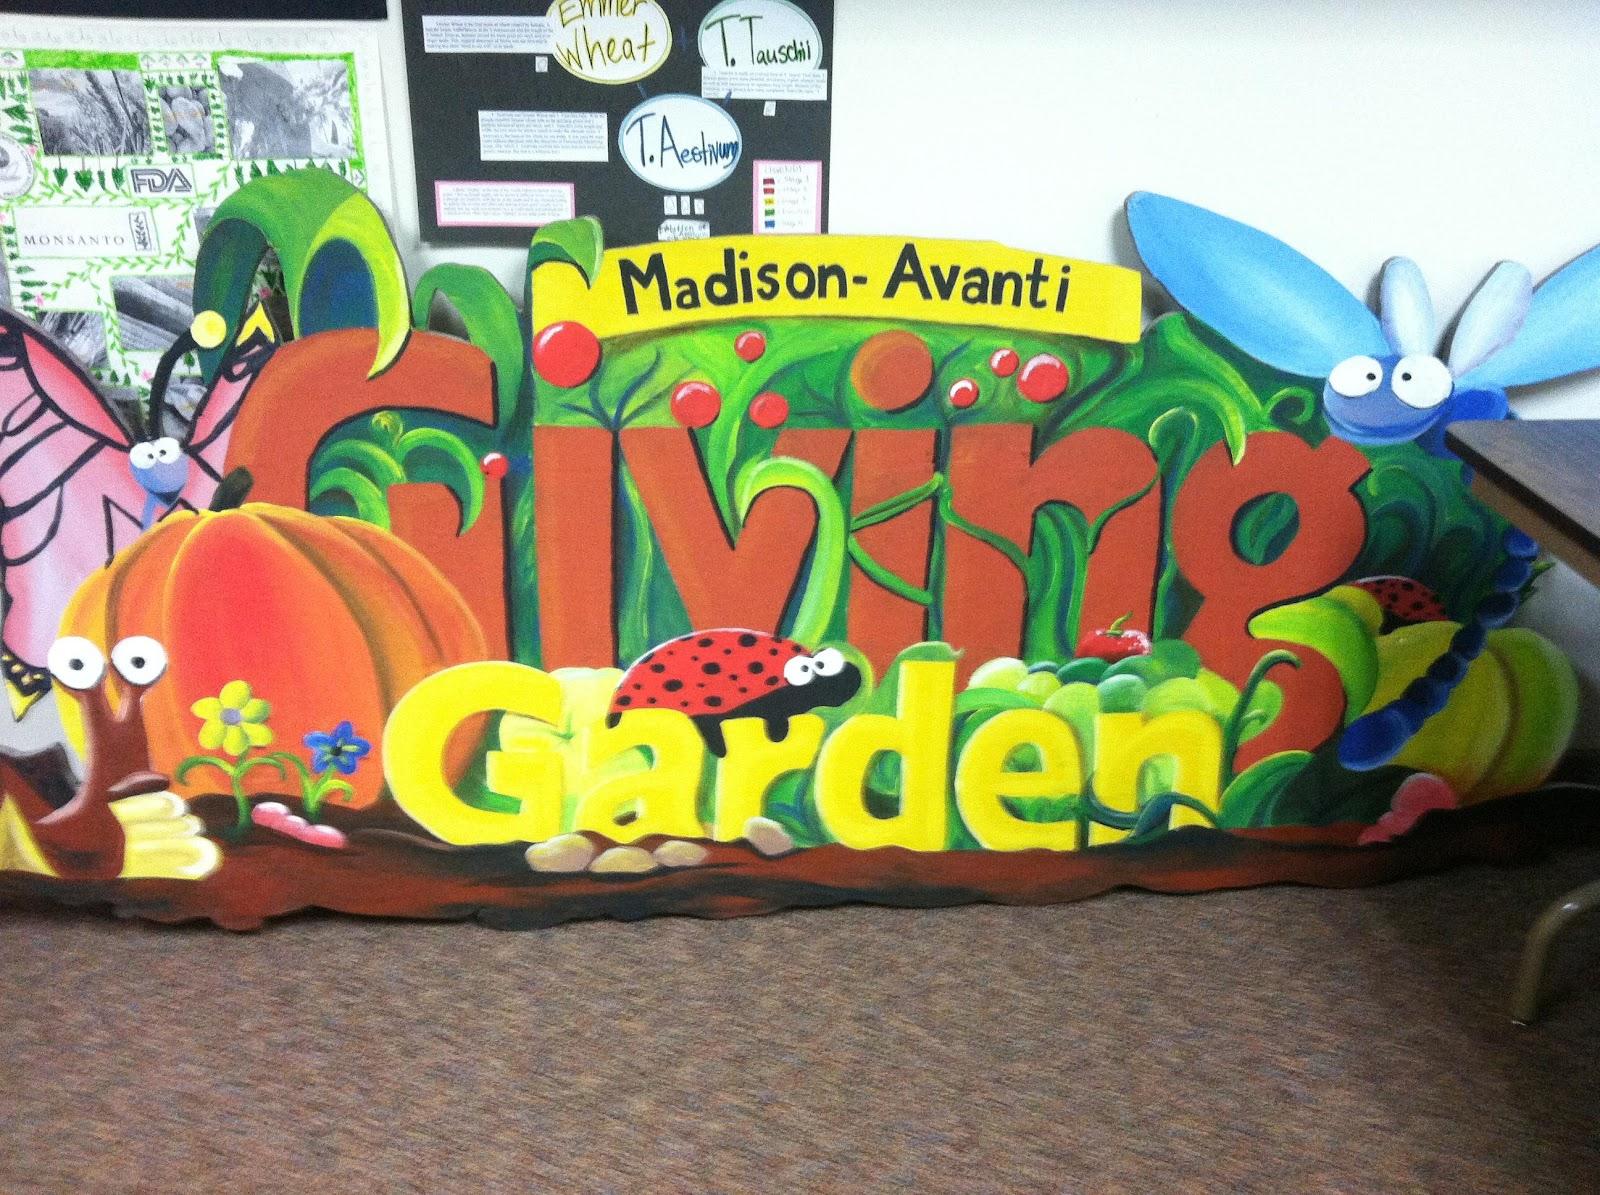 Madison-Avanti Giving Garden Sign